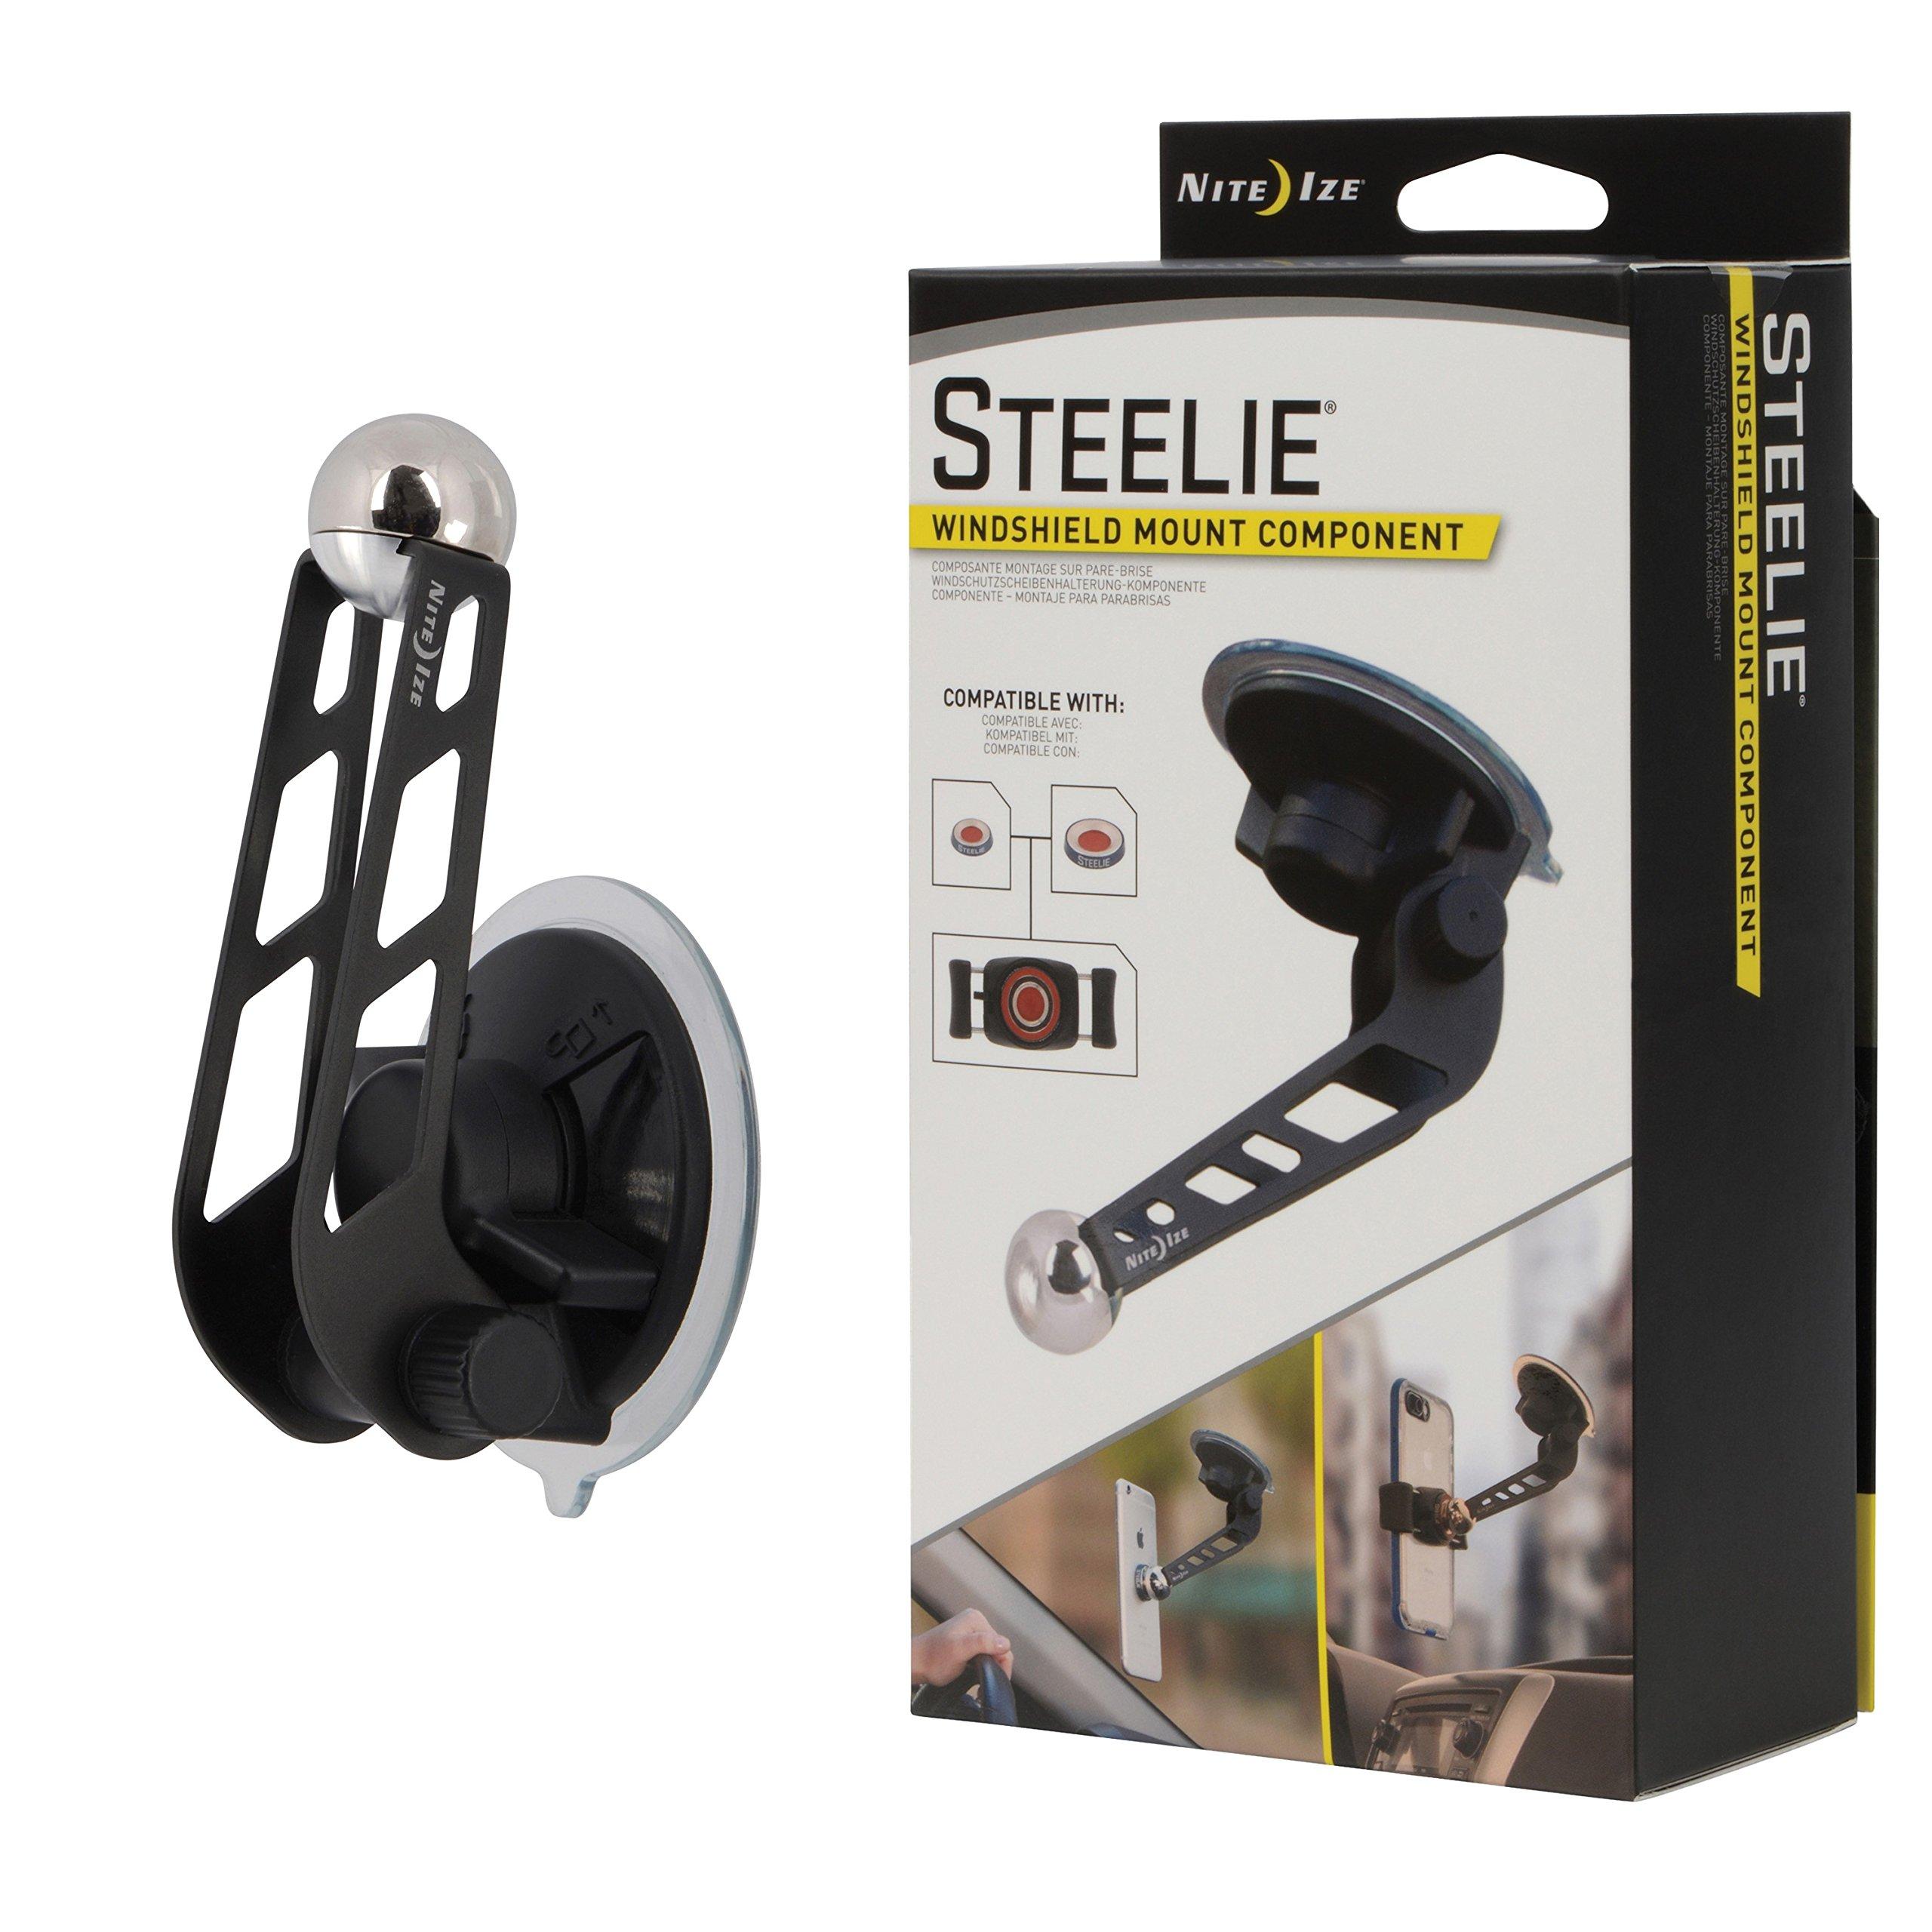 Nite Ize Original Steelie Windshield Mount - Additional Car Windshield Mount for Steelie Magnetic Mounting System